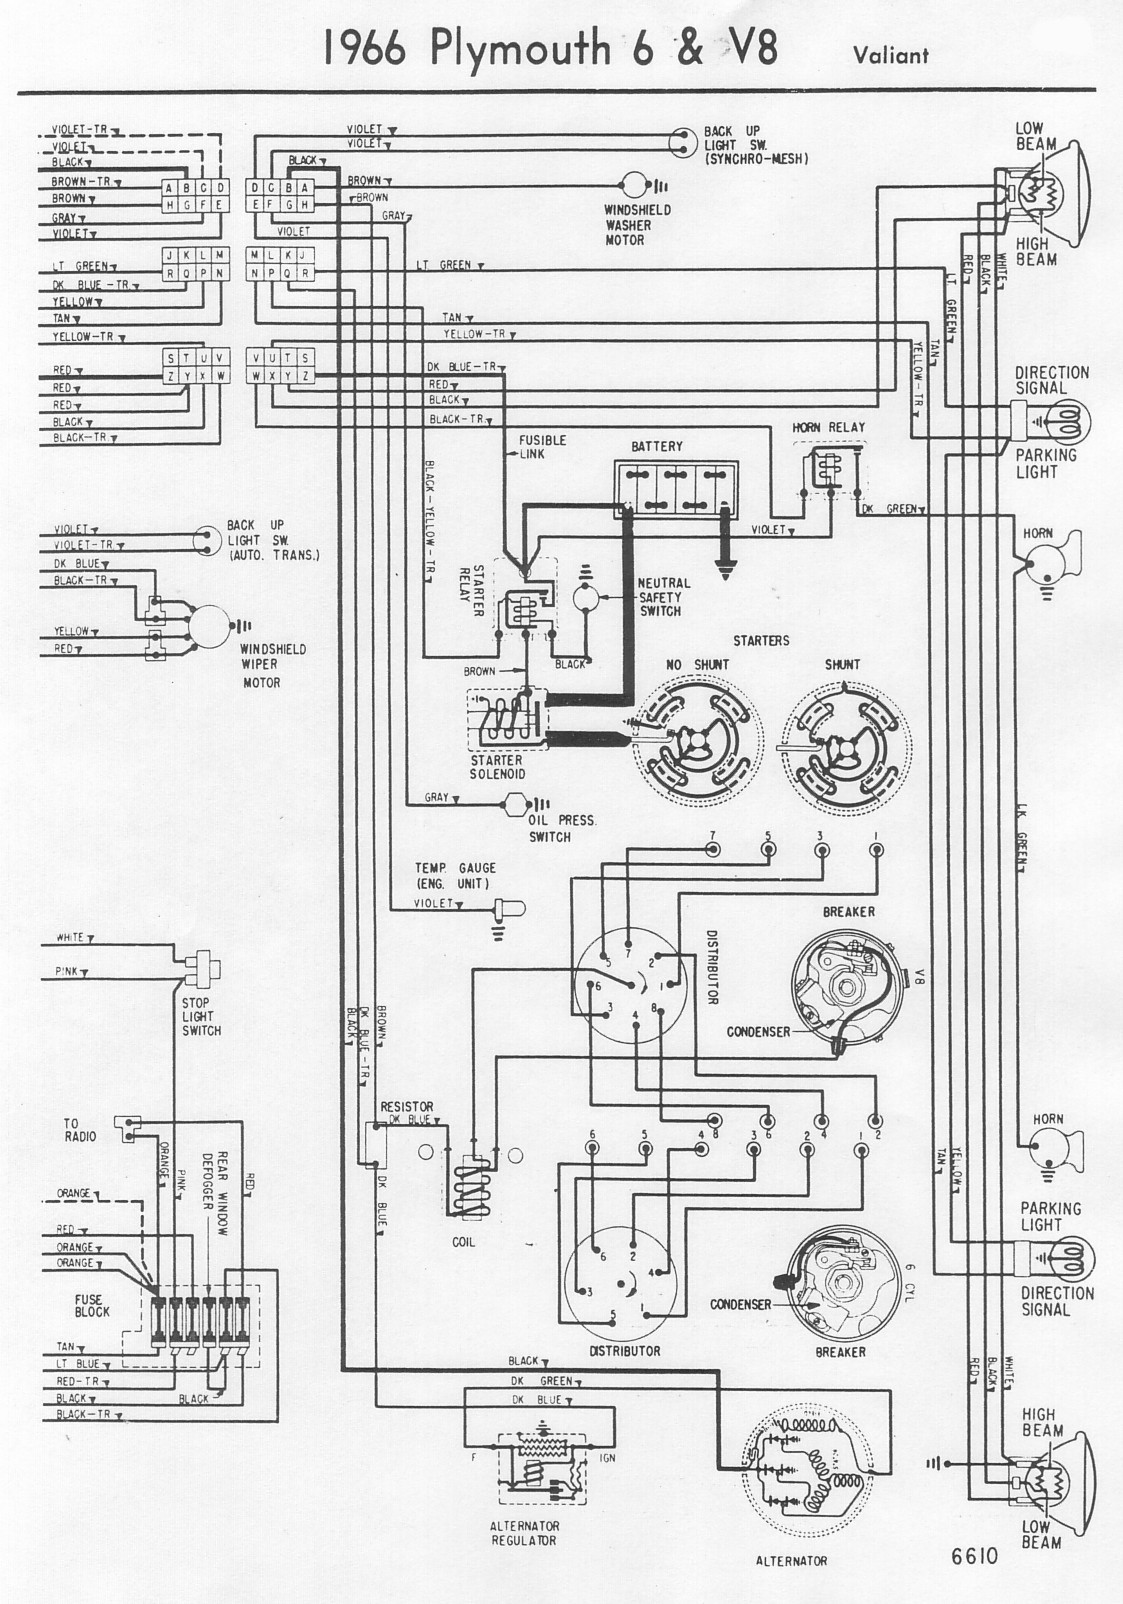 400ex wiring diagram 400ex wiring diagrams instructions  66valiantb?quality\\\\\\